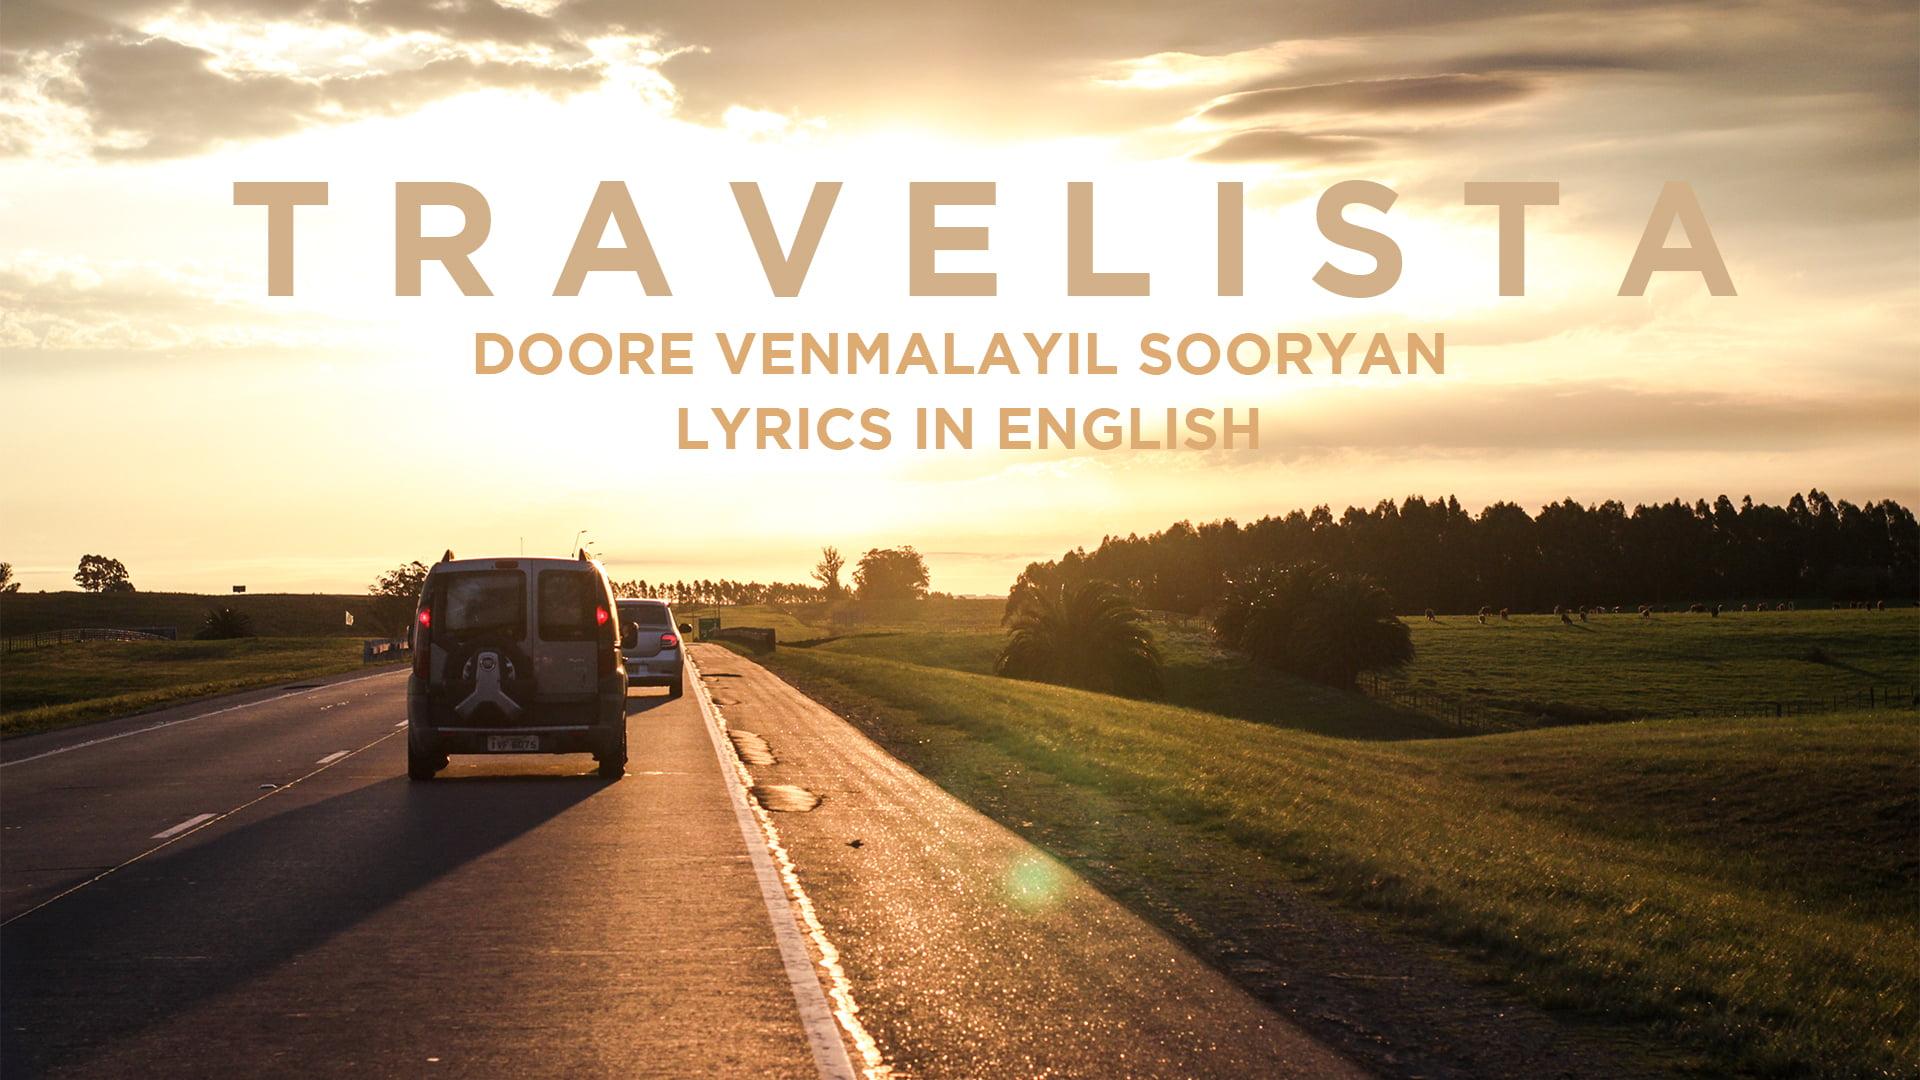 You are currently viewing Doore venmalayil sooryan lyrics in English Travelista,  free Download lyrics